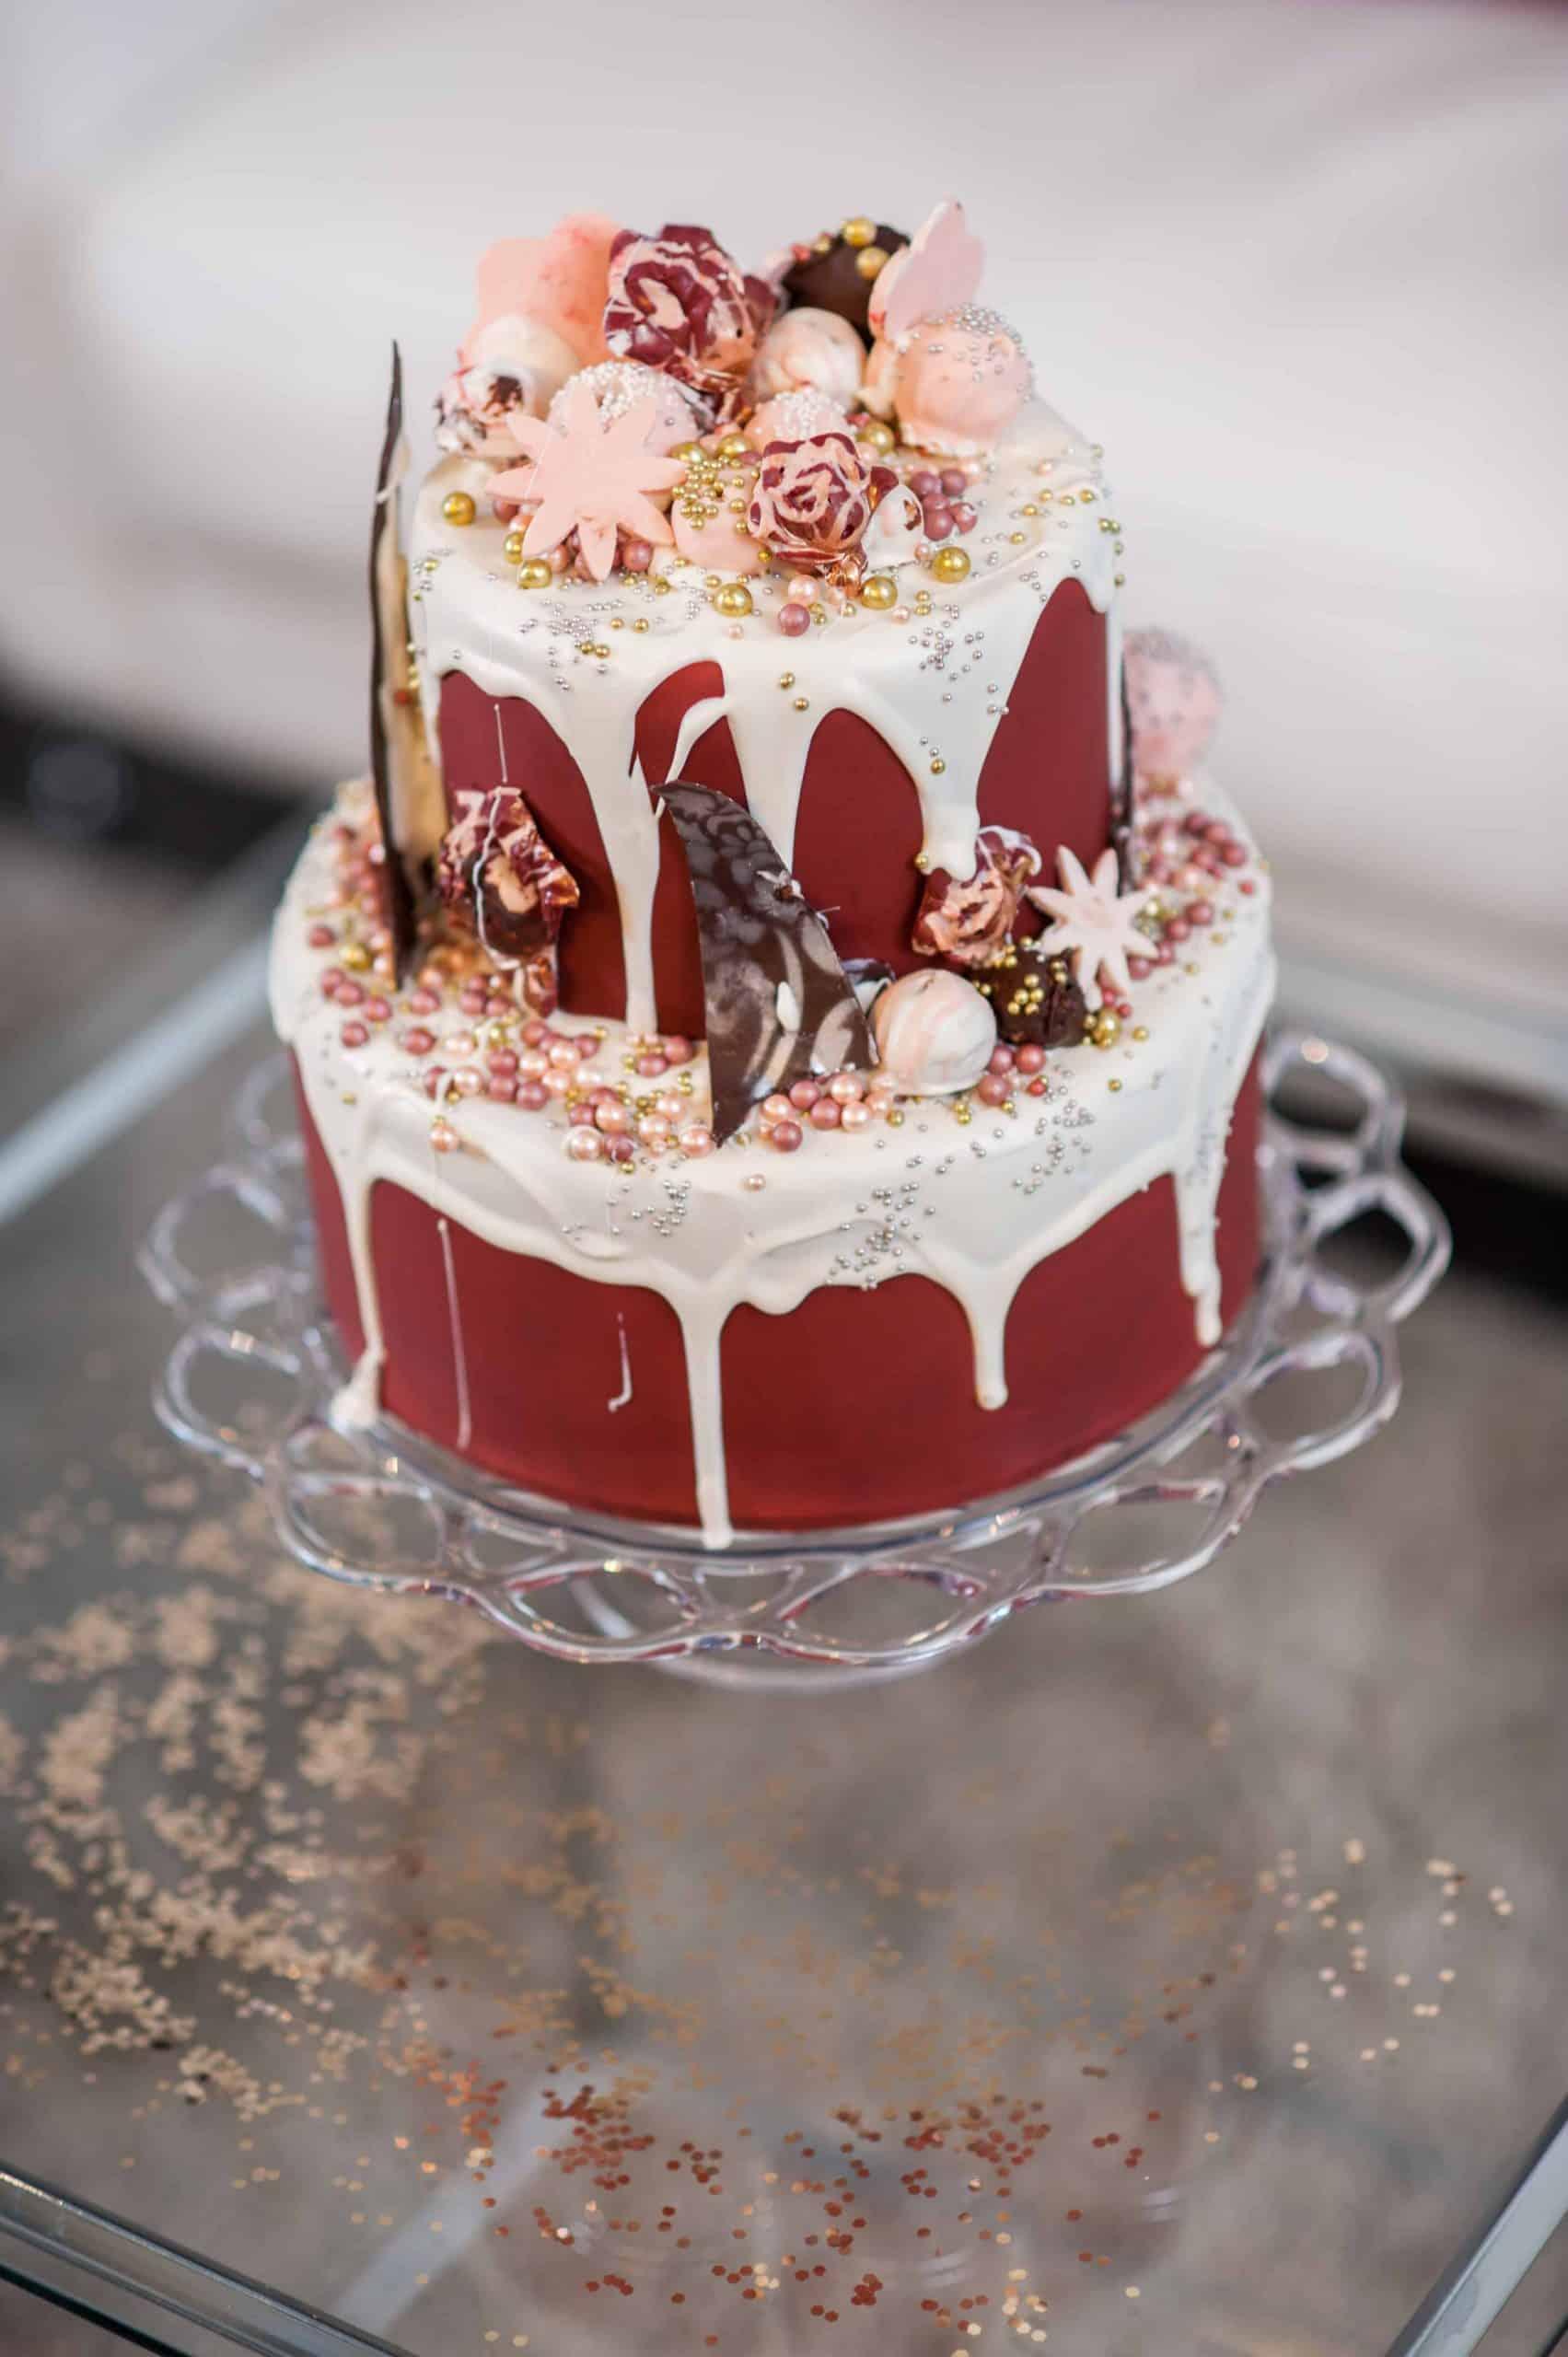 The Makery Cake Company - White Chocolate and Burgundy Drip Cake